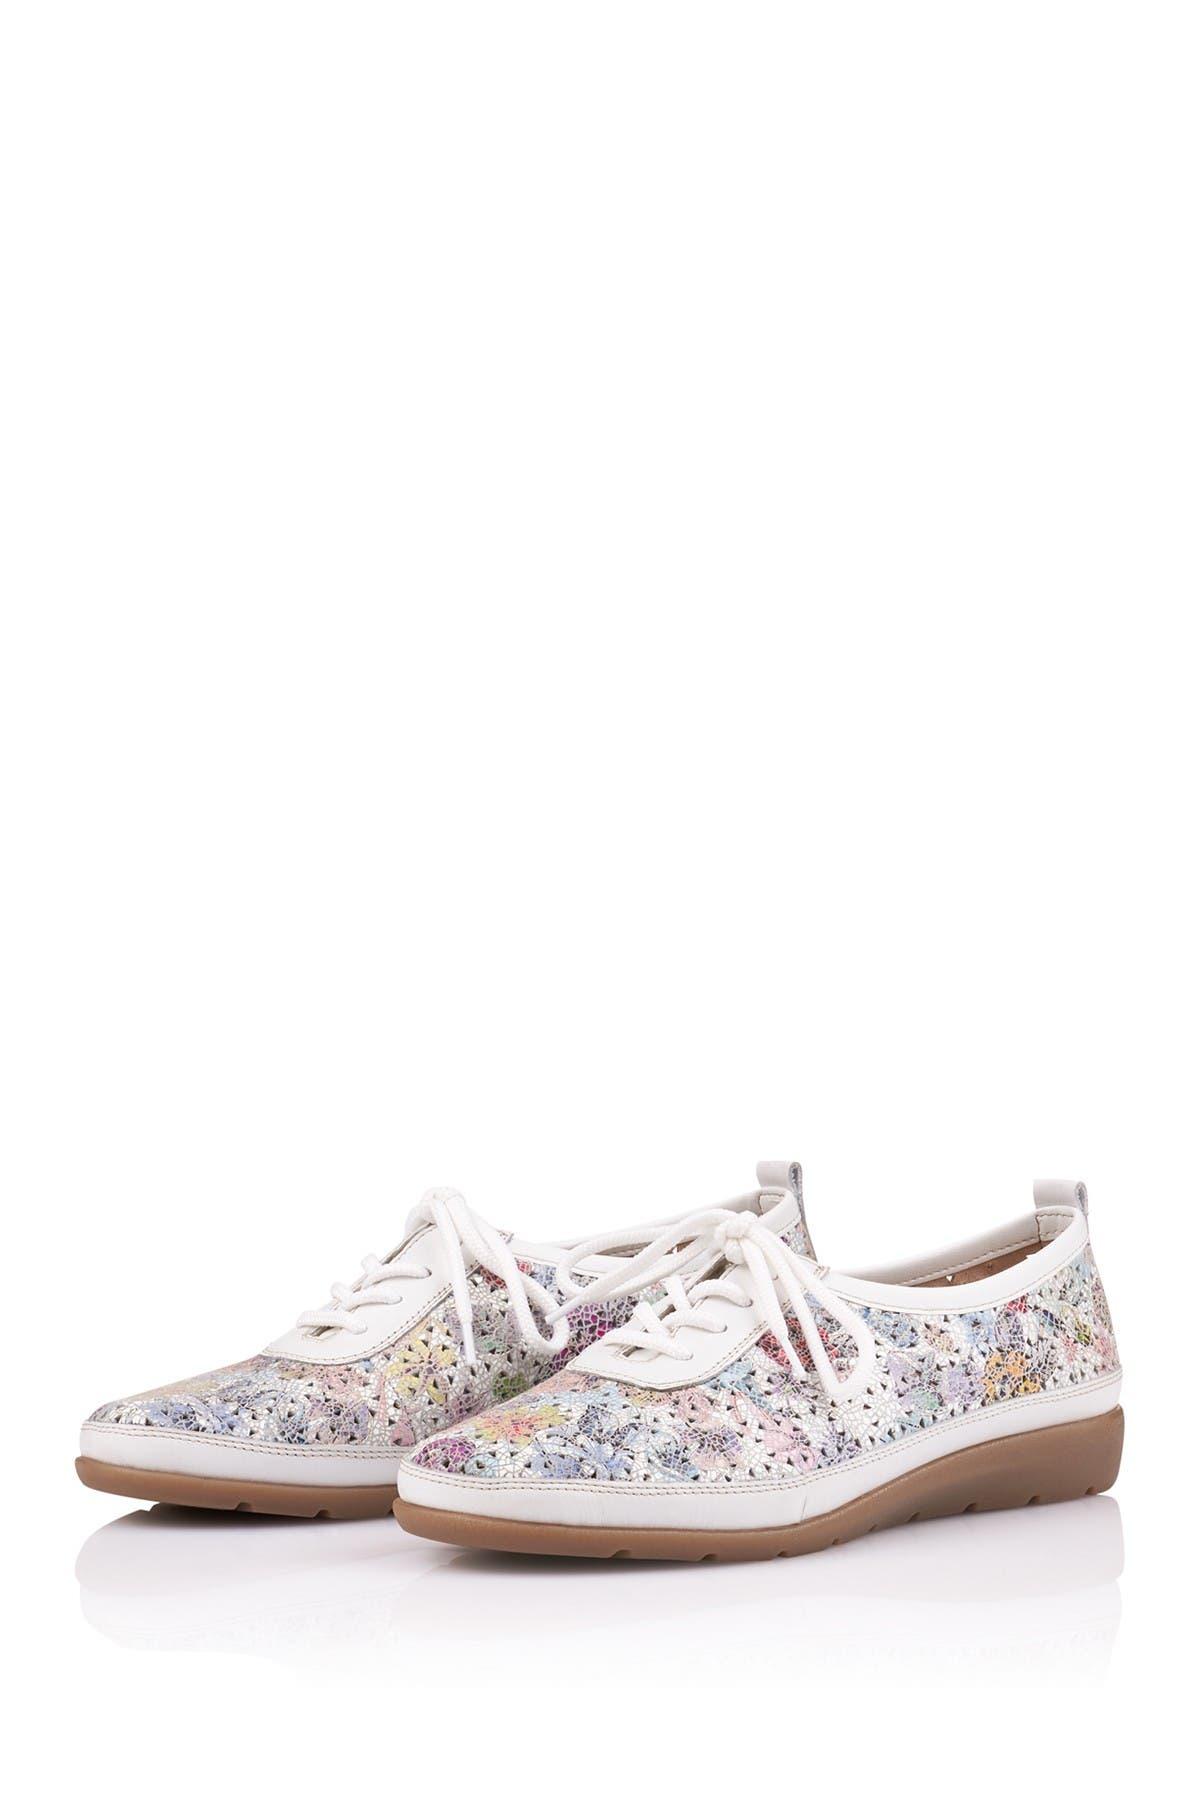 Image of Remonte Malea Sneaker